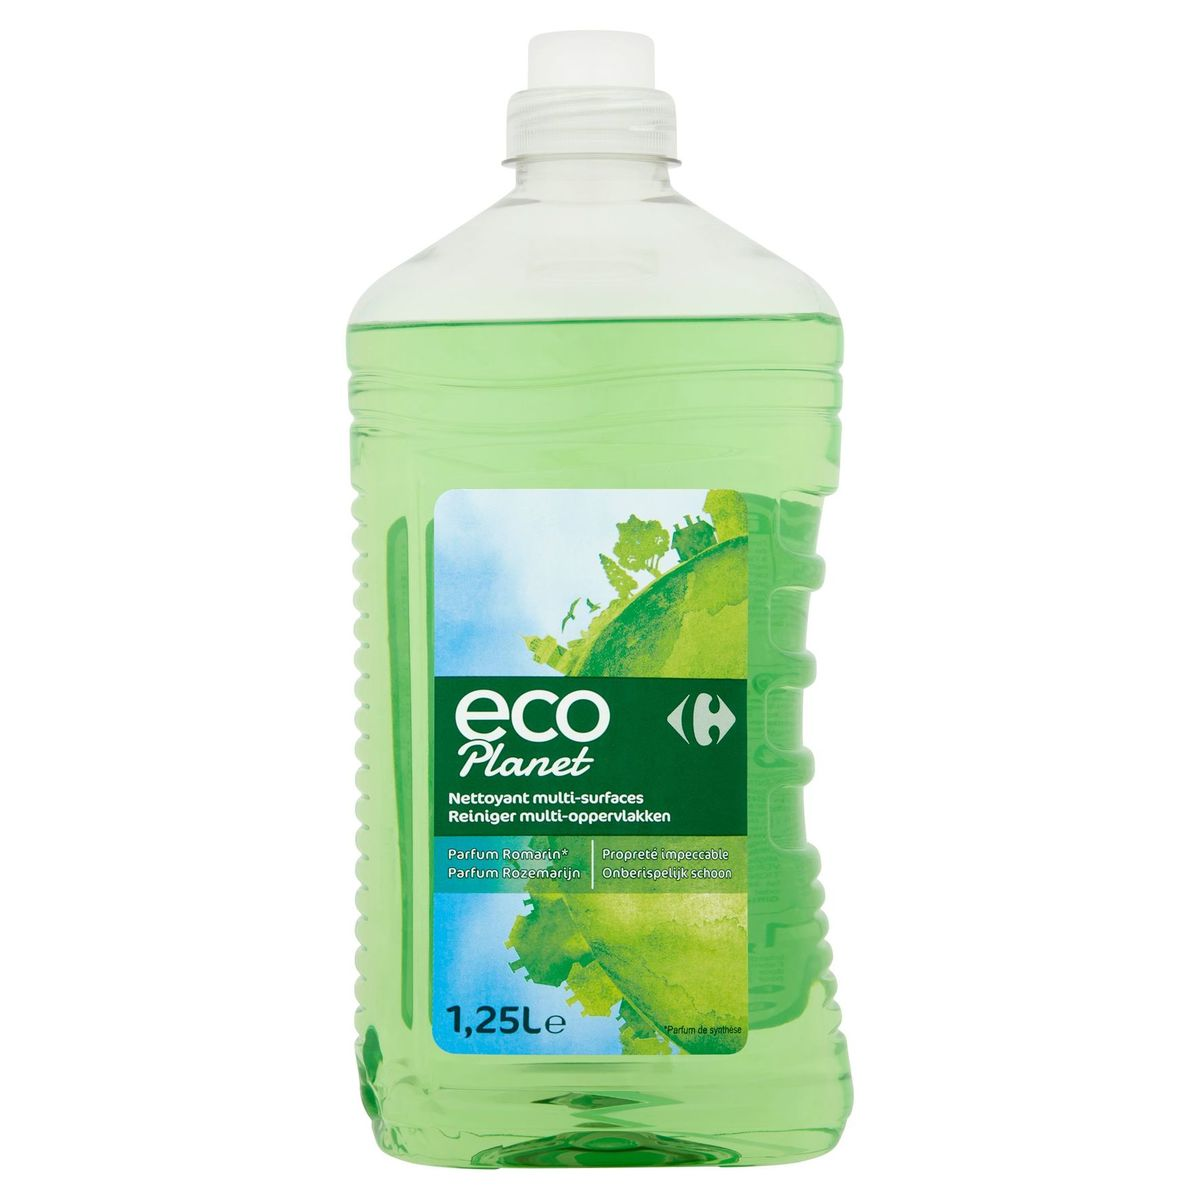 Carrefour Eco Planet Reiniger Multi-Oppervlakken 1.25 L